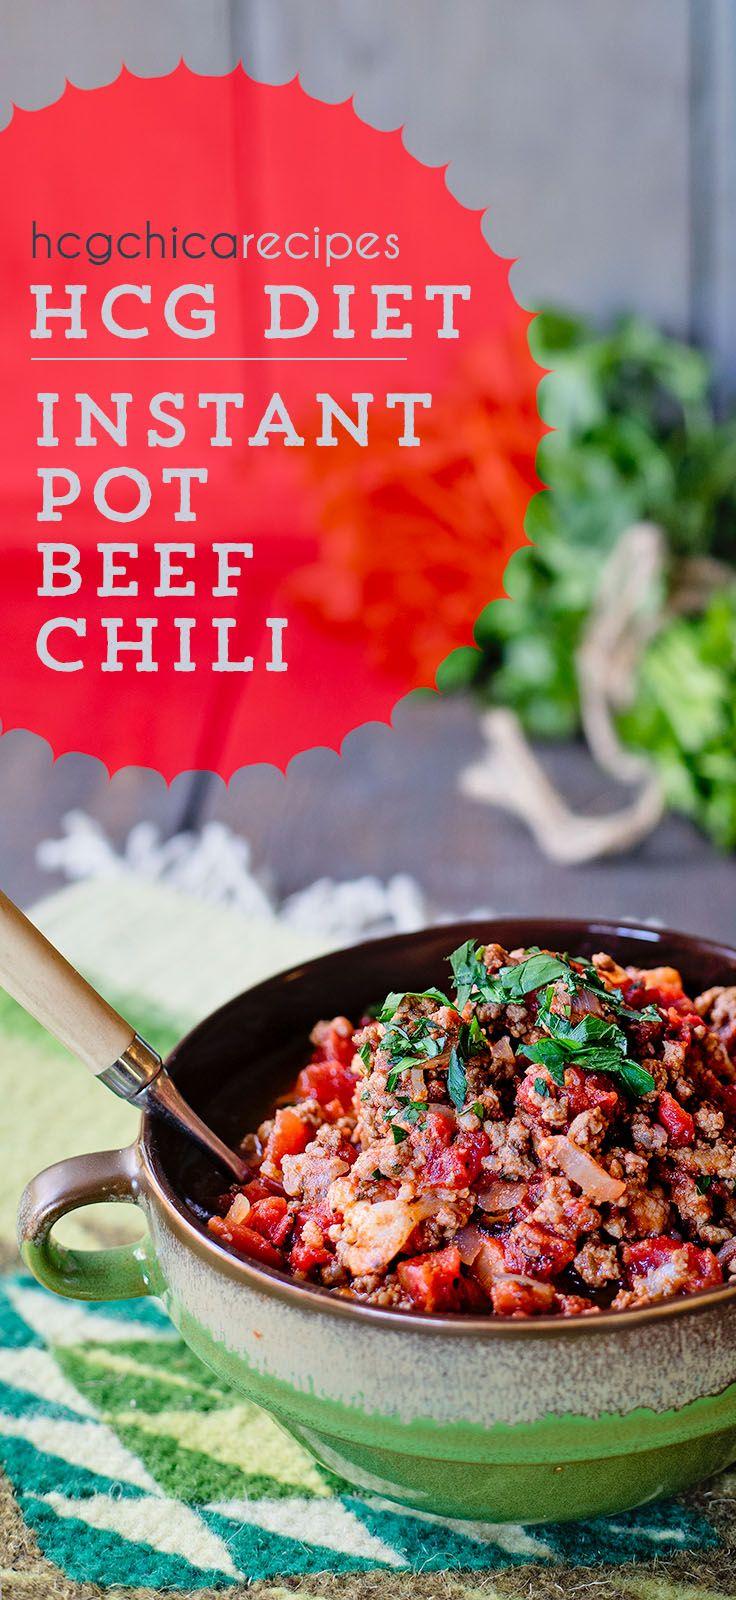 Hcg Diet Phase 2 Recipes Instant Pot Hcg Diet Ground Beef Quick